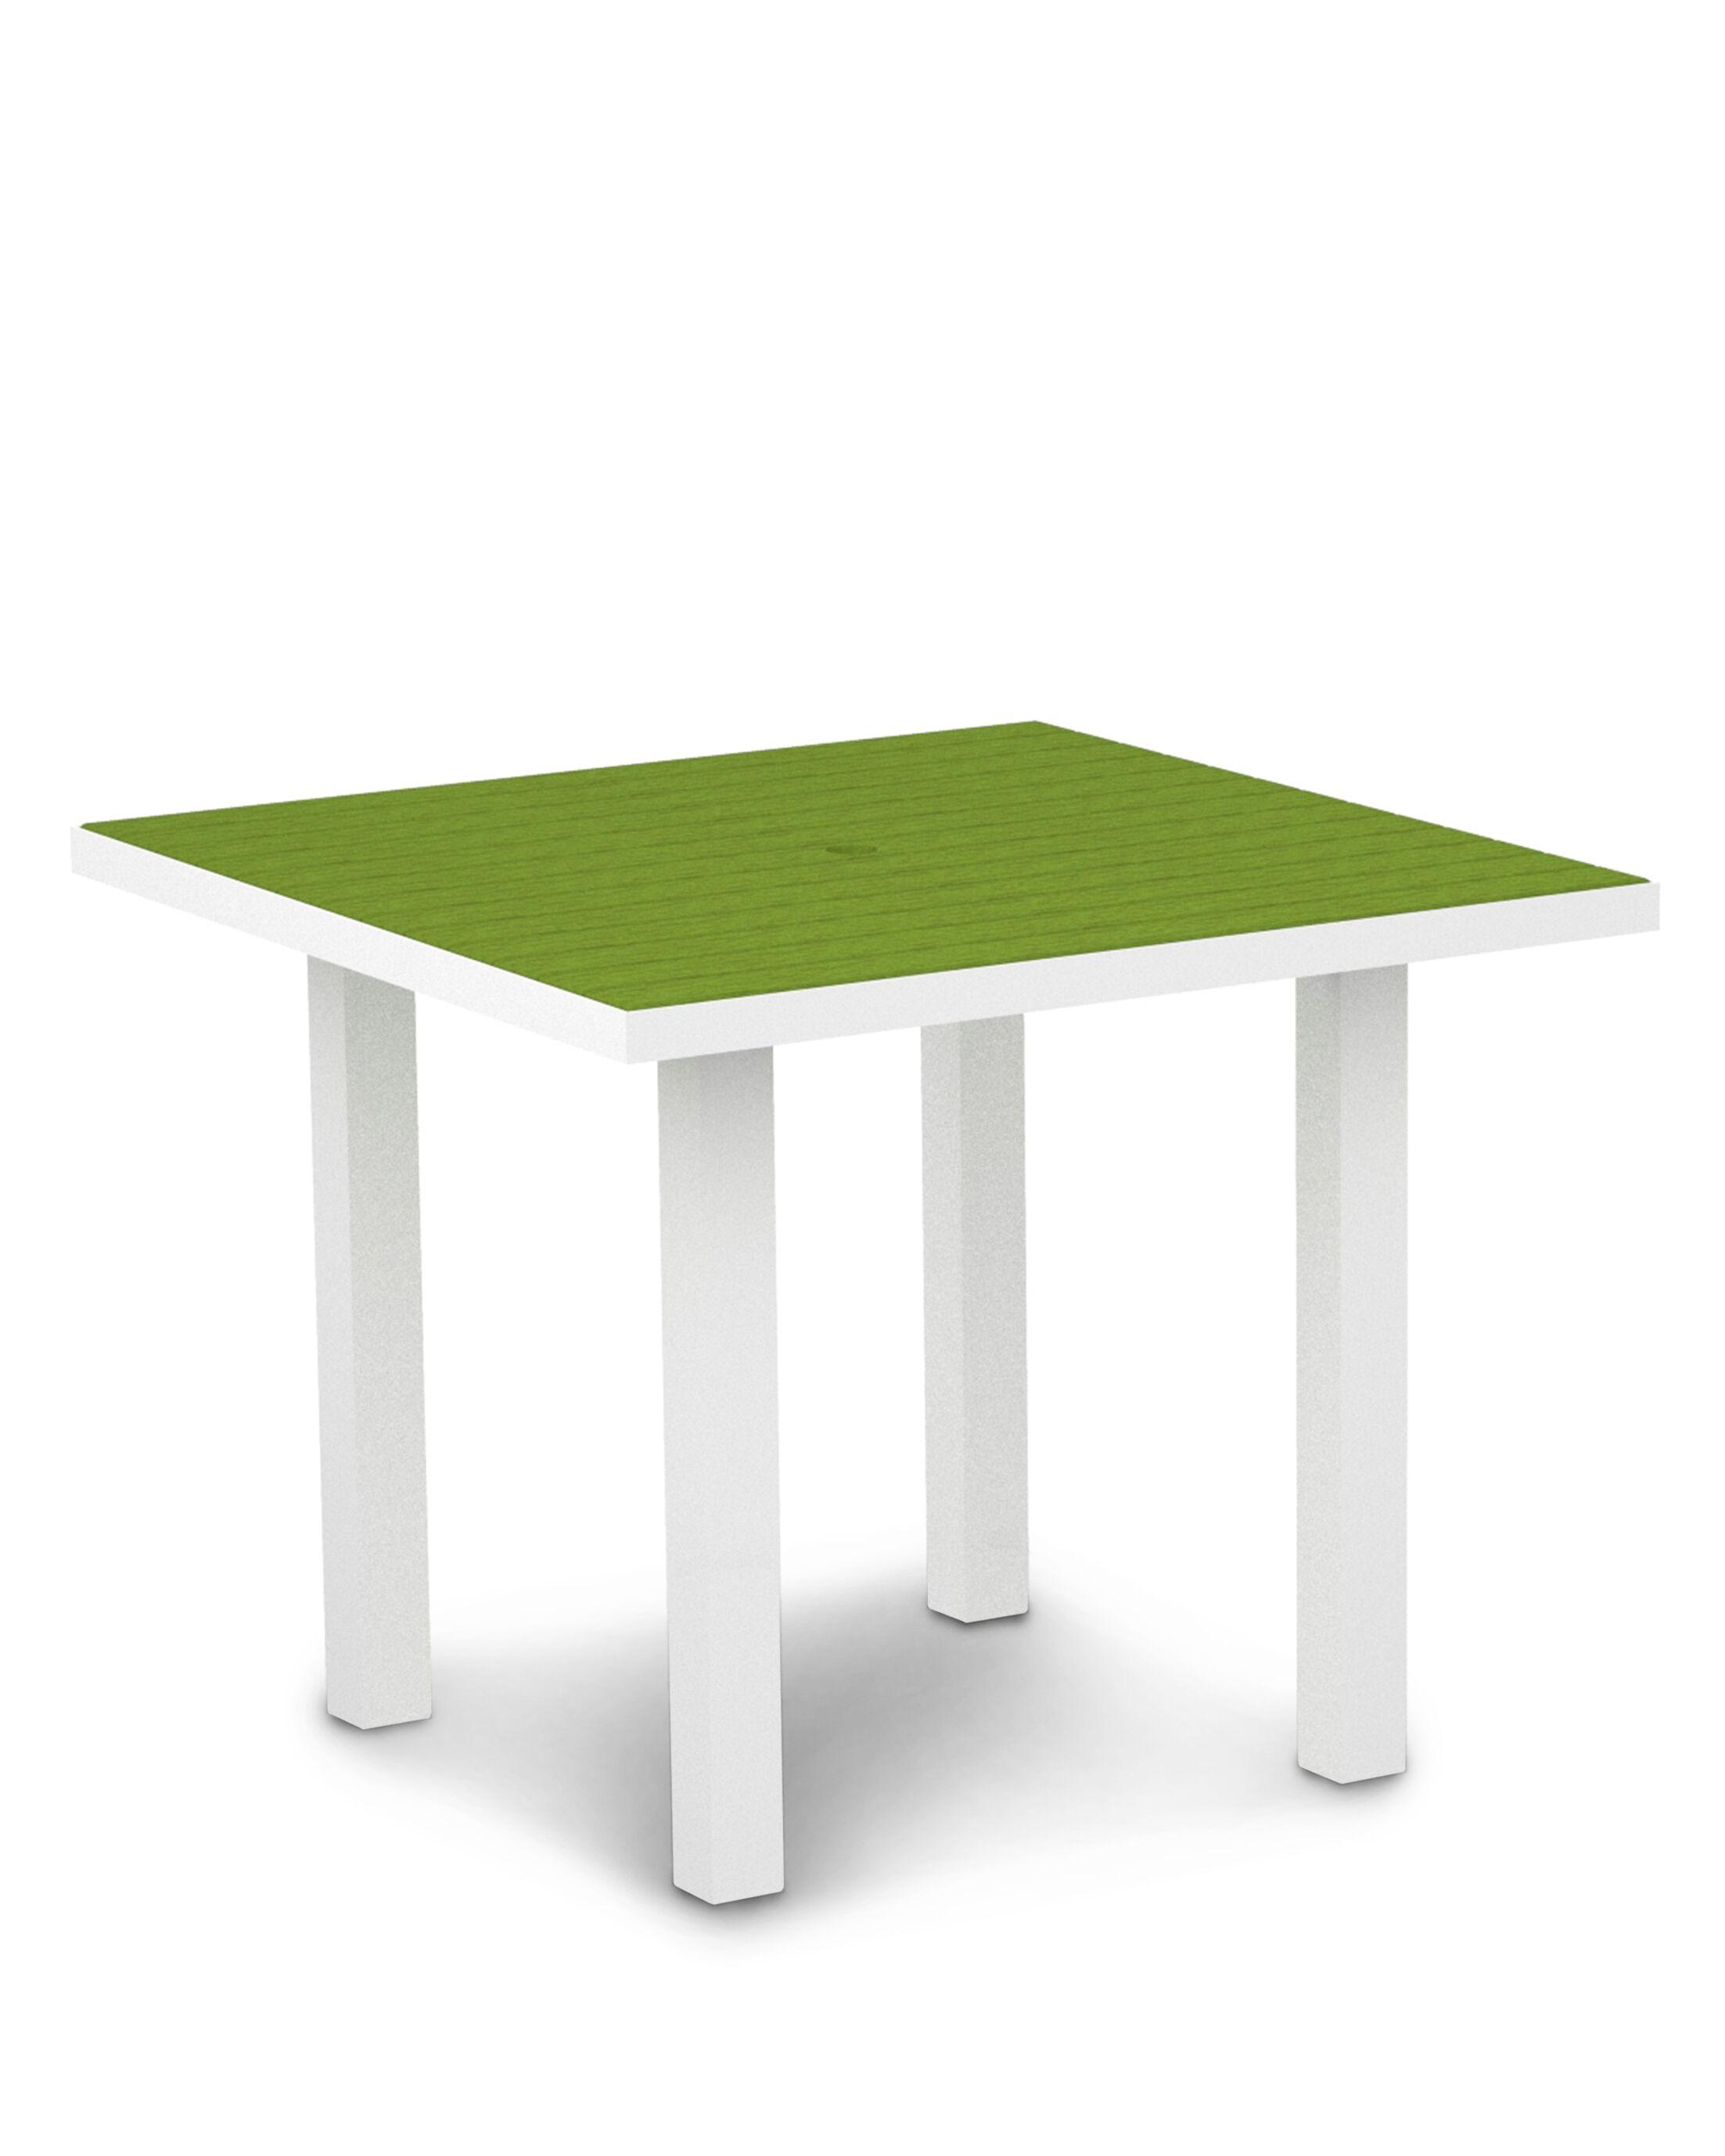 Euro Dining Table Finish: Textured White Aluminum Frame / Lime